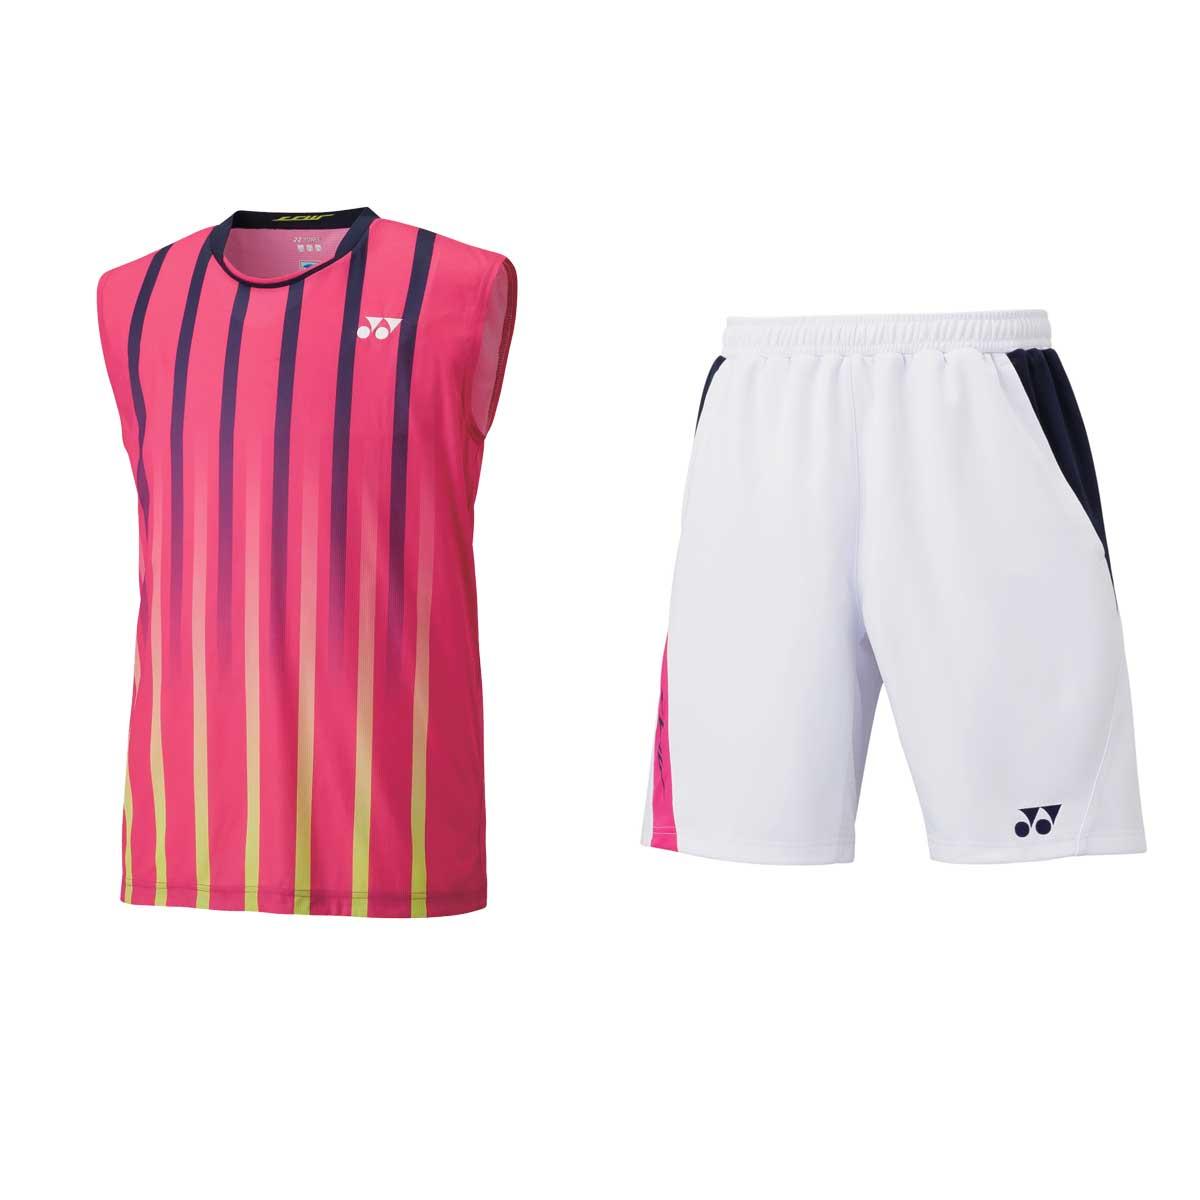 c60024dd4dffb Buy Yonex Lee Chong Wei Limited Edition T-shirt   Shorts Online